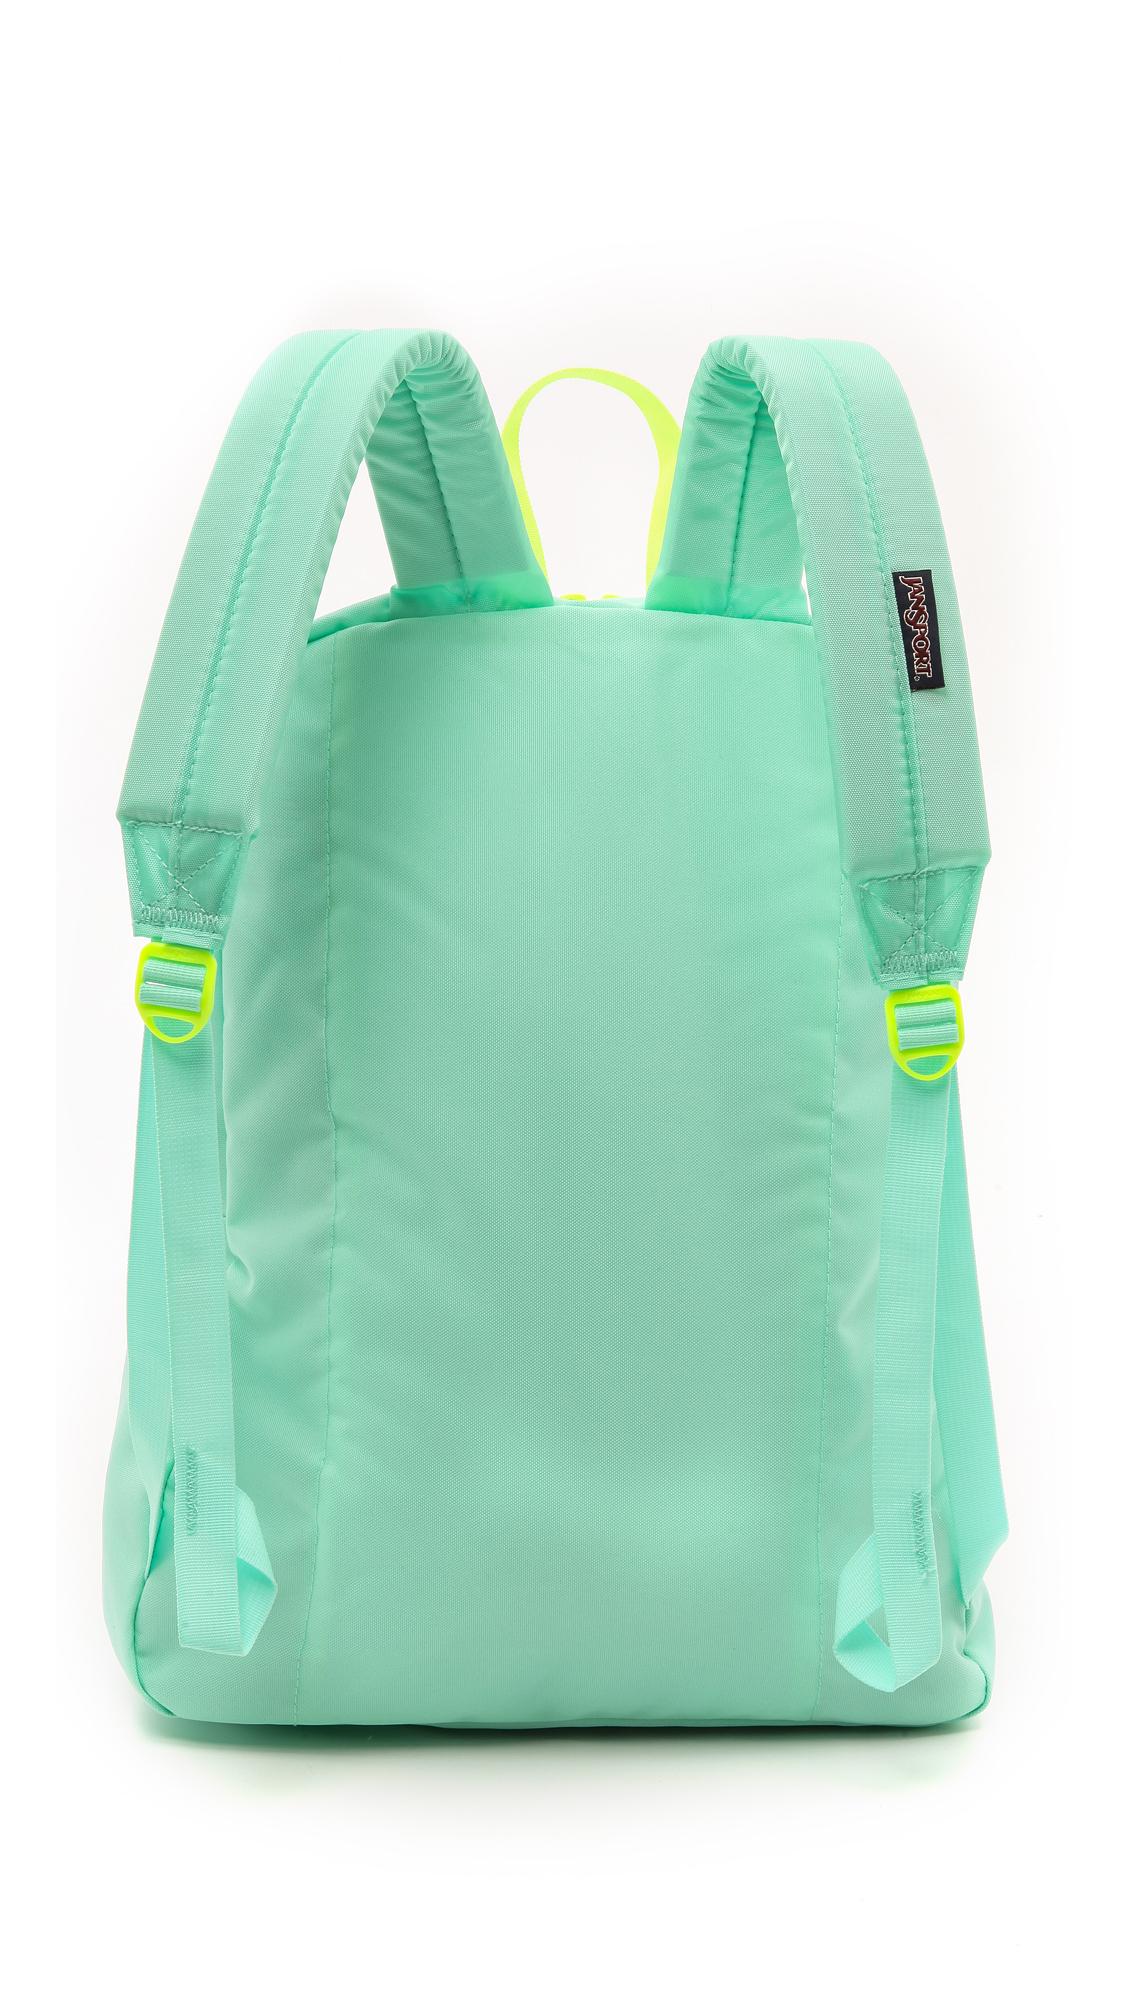 Similiar Black And Neon Green Jansport Backpacks Keywords